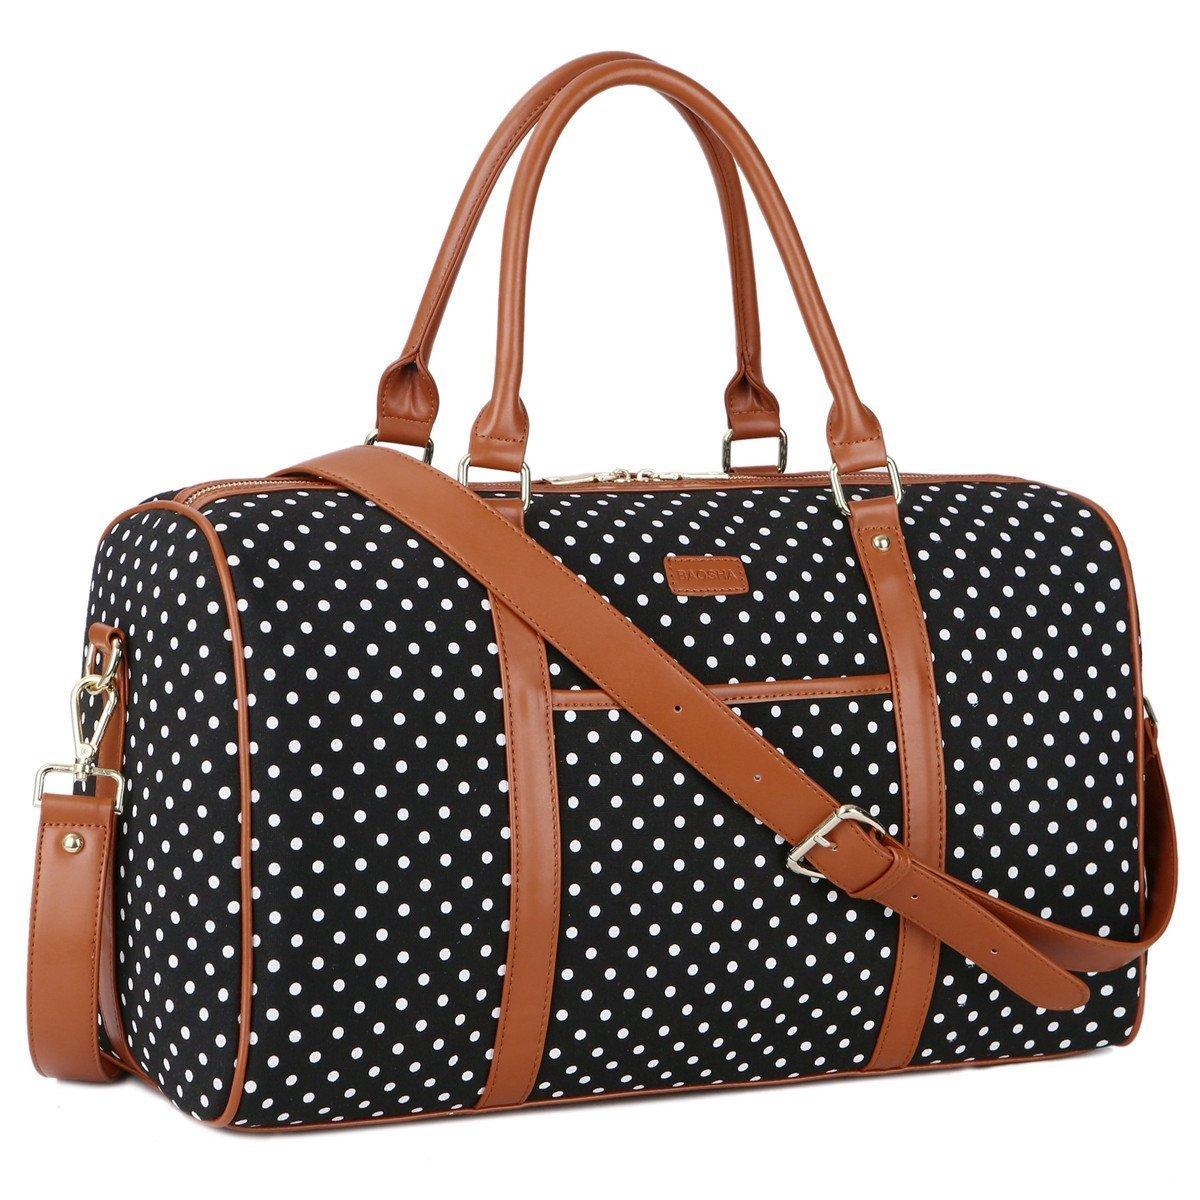 BAOSHA HB-25 Cute Lady Women Canvas Travel Bag Weekender Overnight Bag Carry-on Duffel Tote Bag (Black Dot)